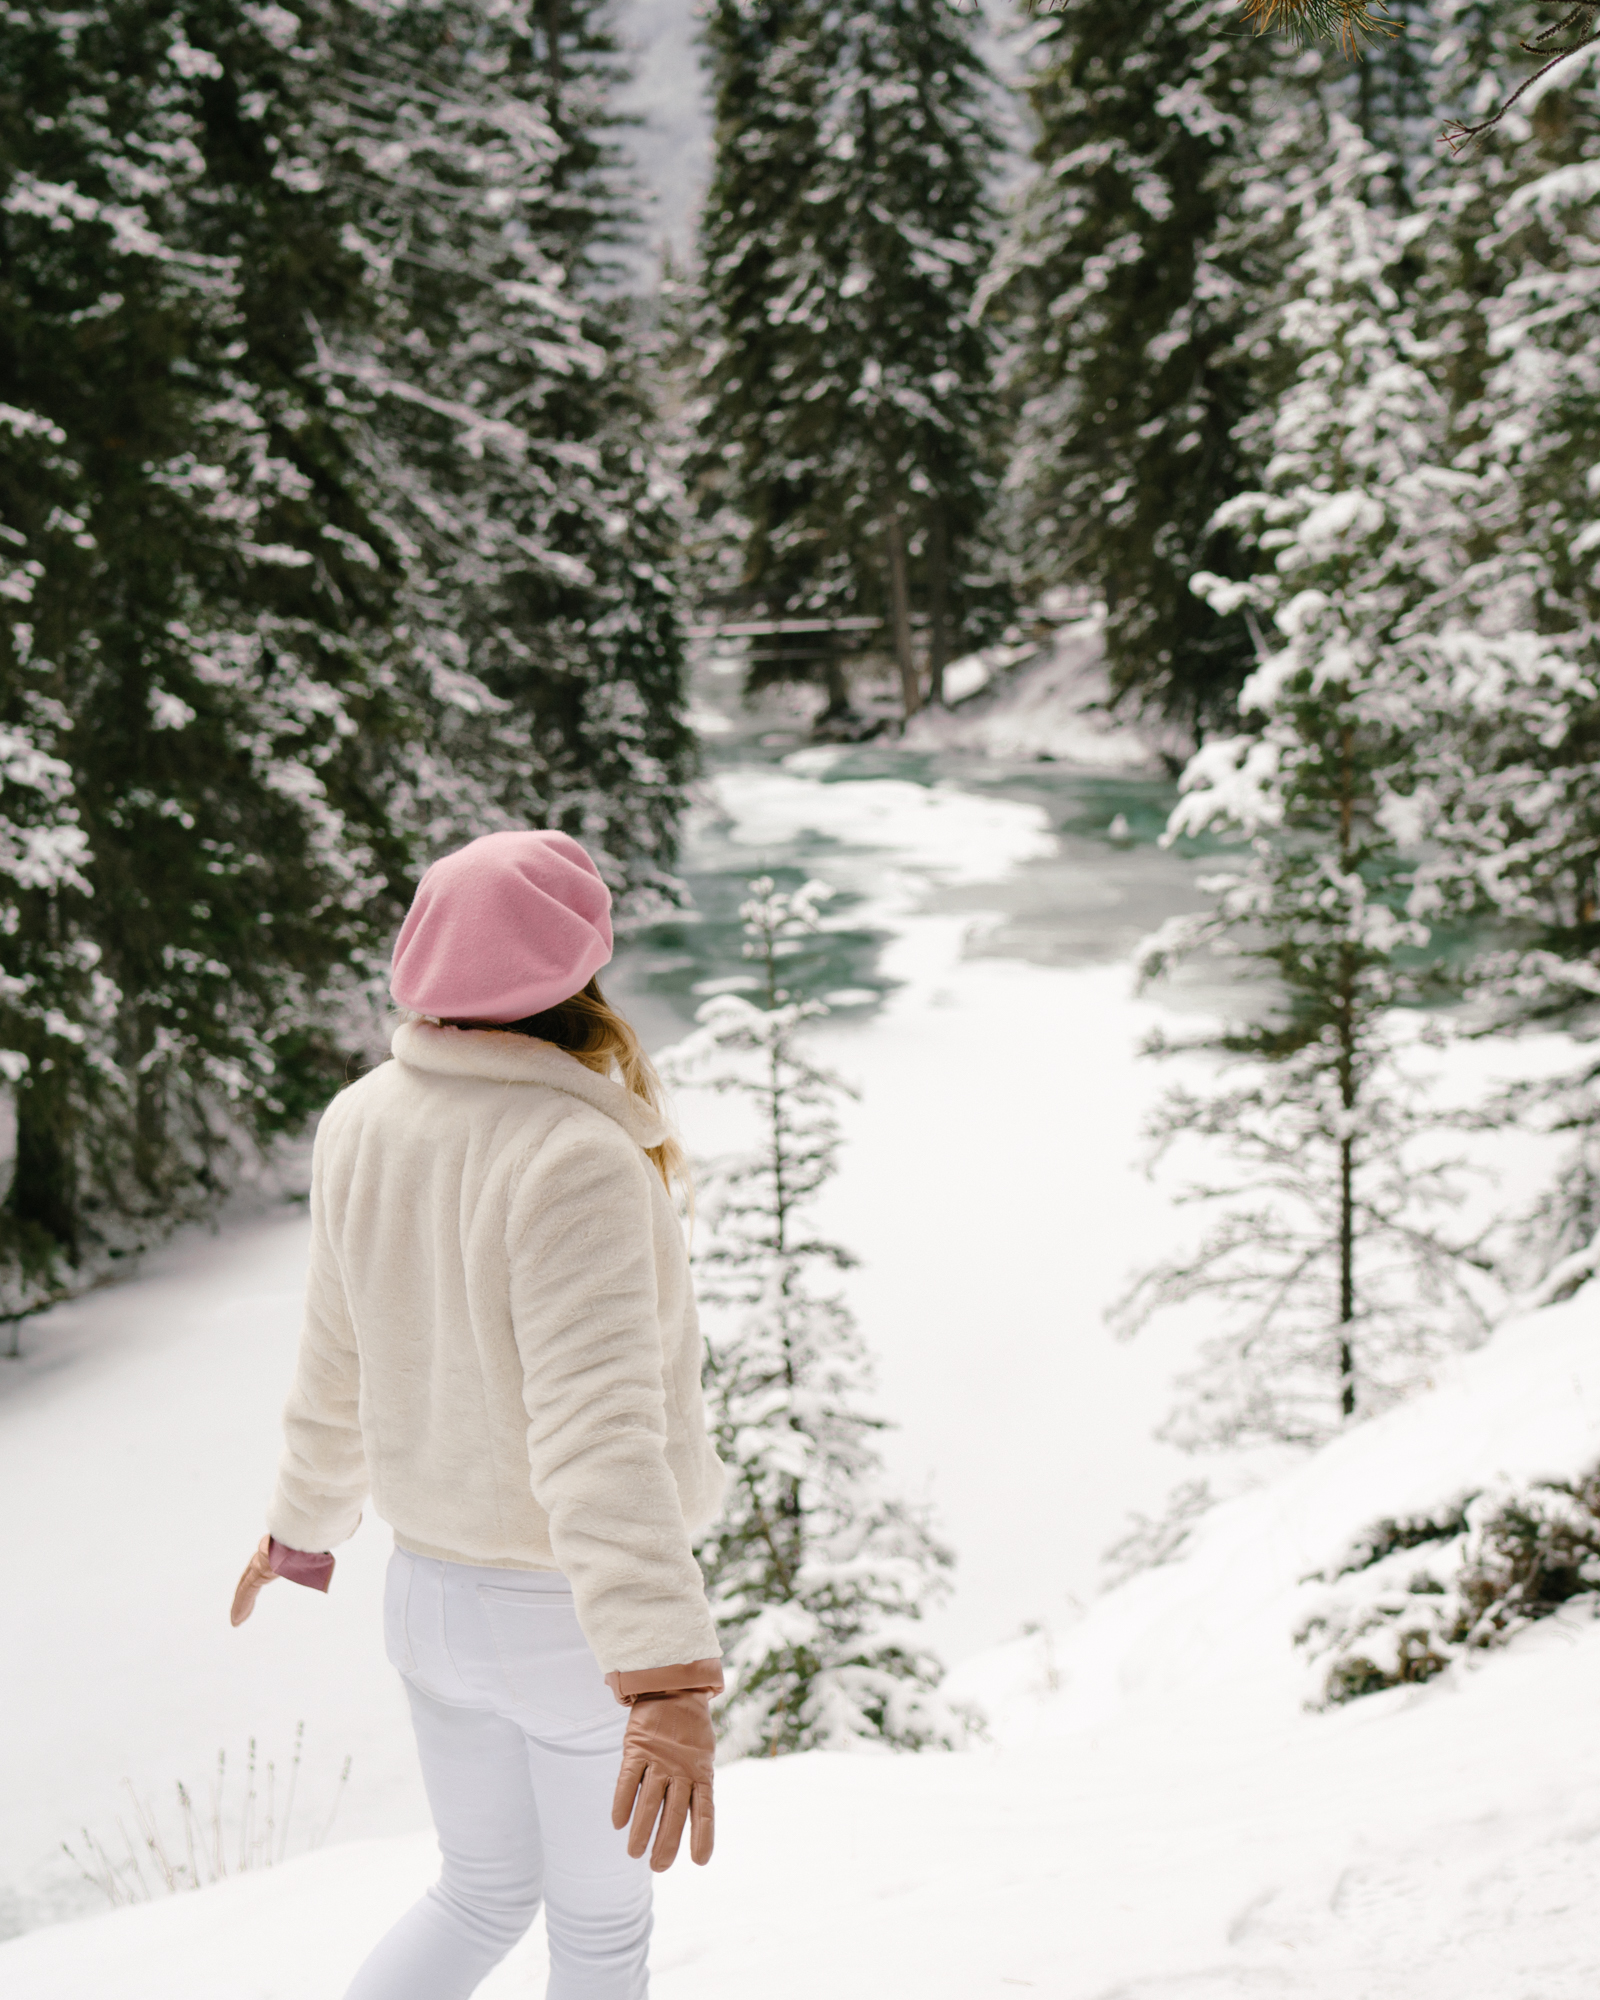 Banff Winter Travel Guide